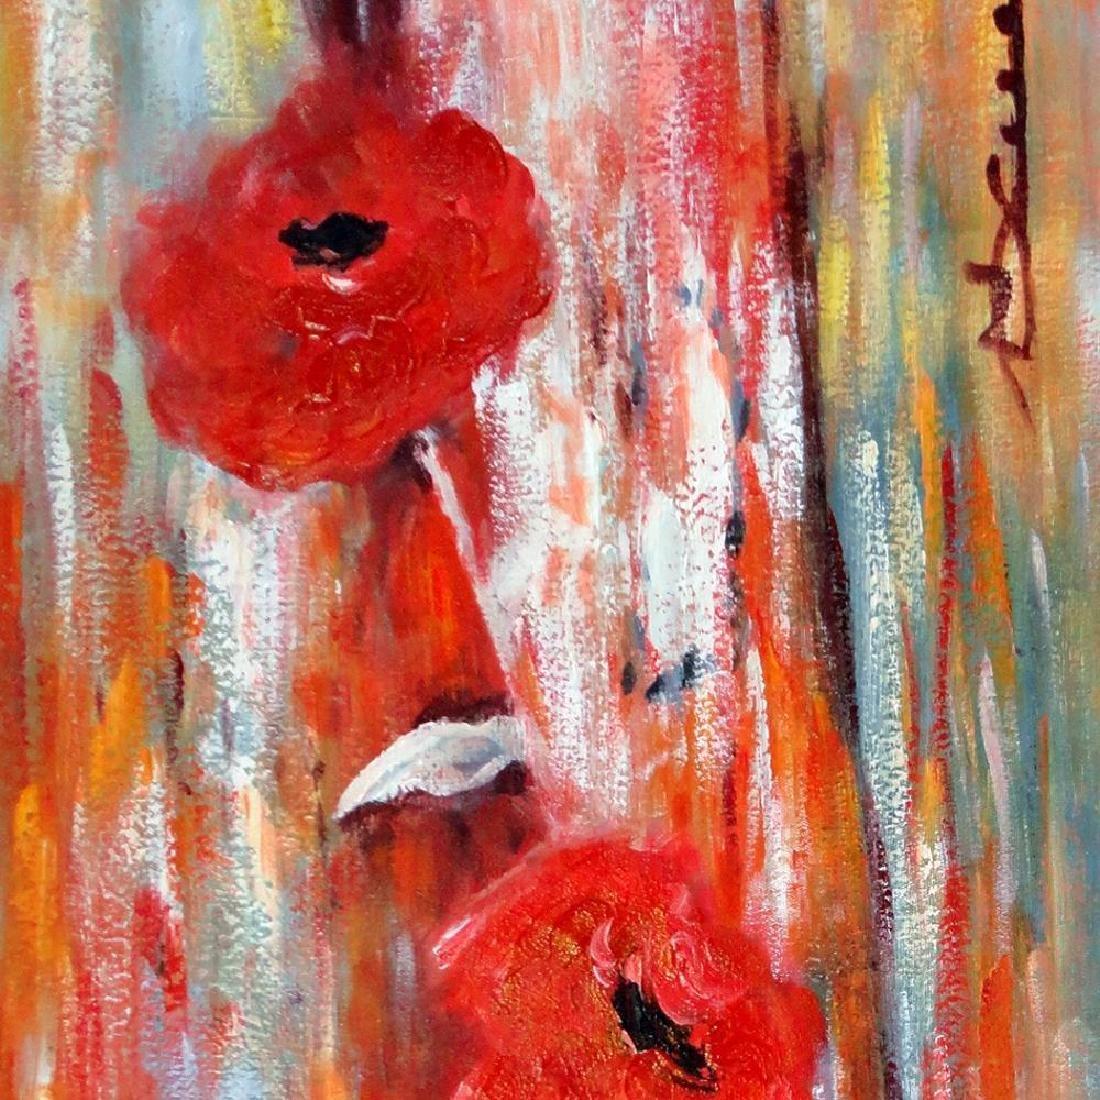 Floral in Vase Large Painting on Canvas Swahn Original - 4